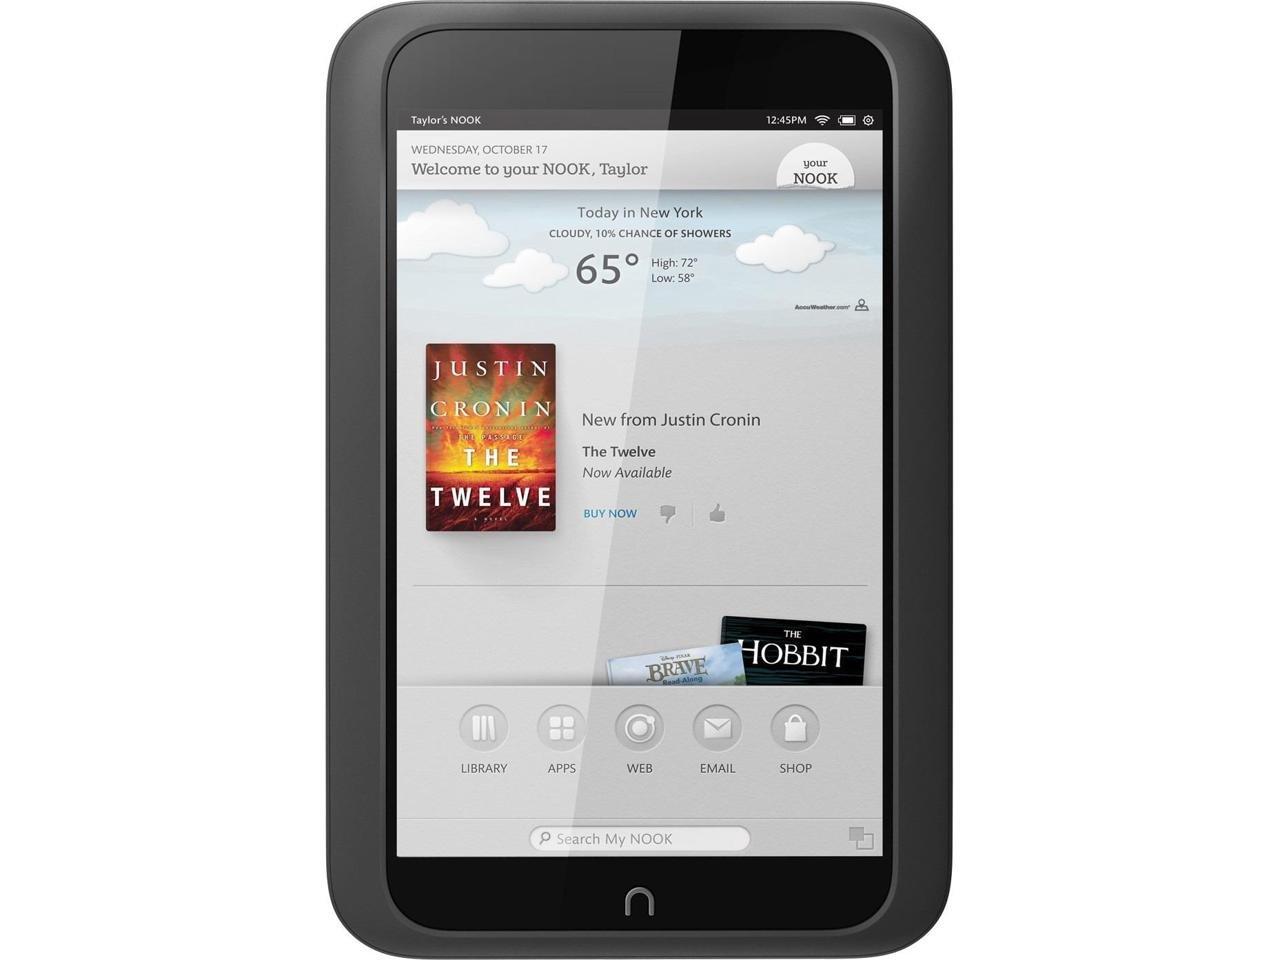 Barnes & Noble NOOK HD Tablet 8GB Snow (BNTV400-8GB-WHT)